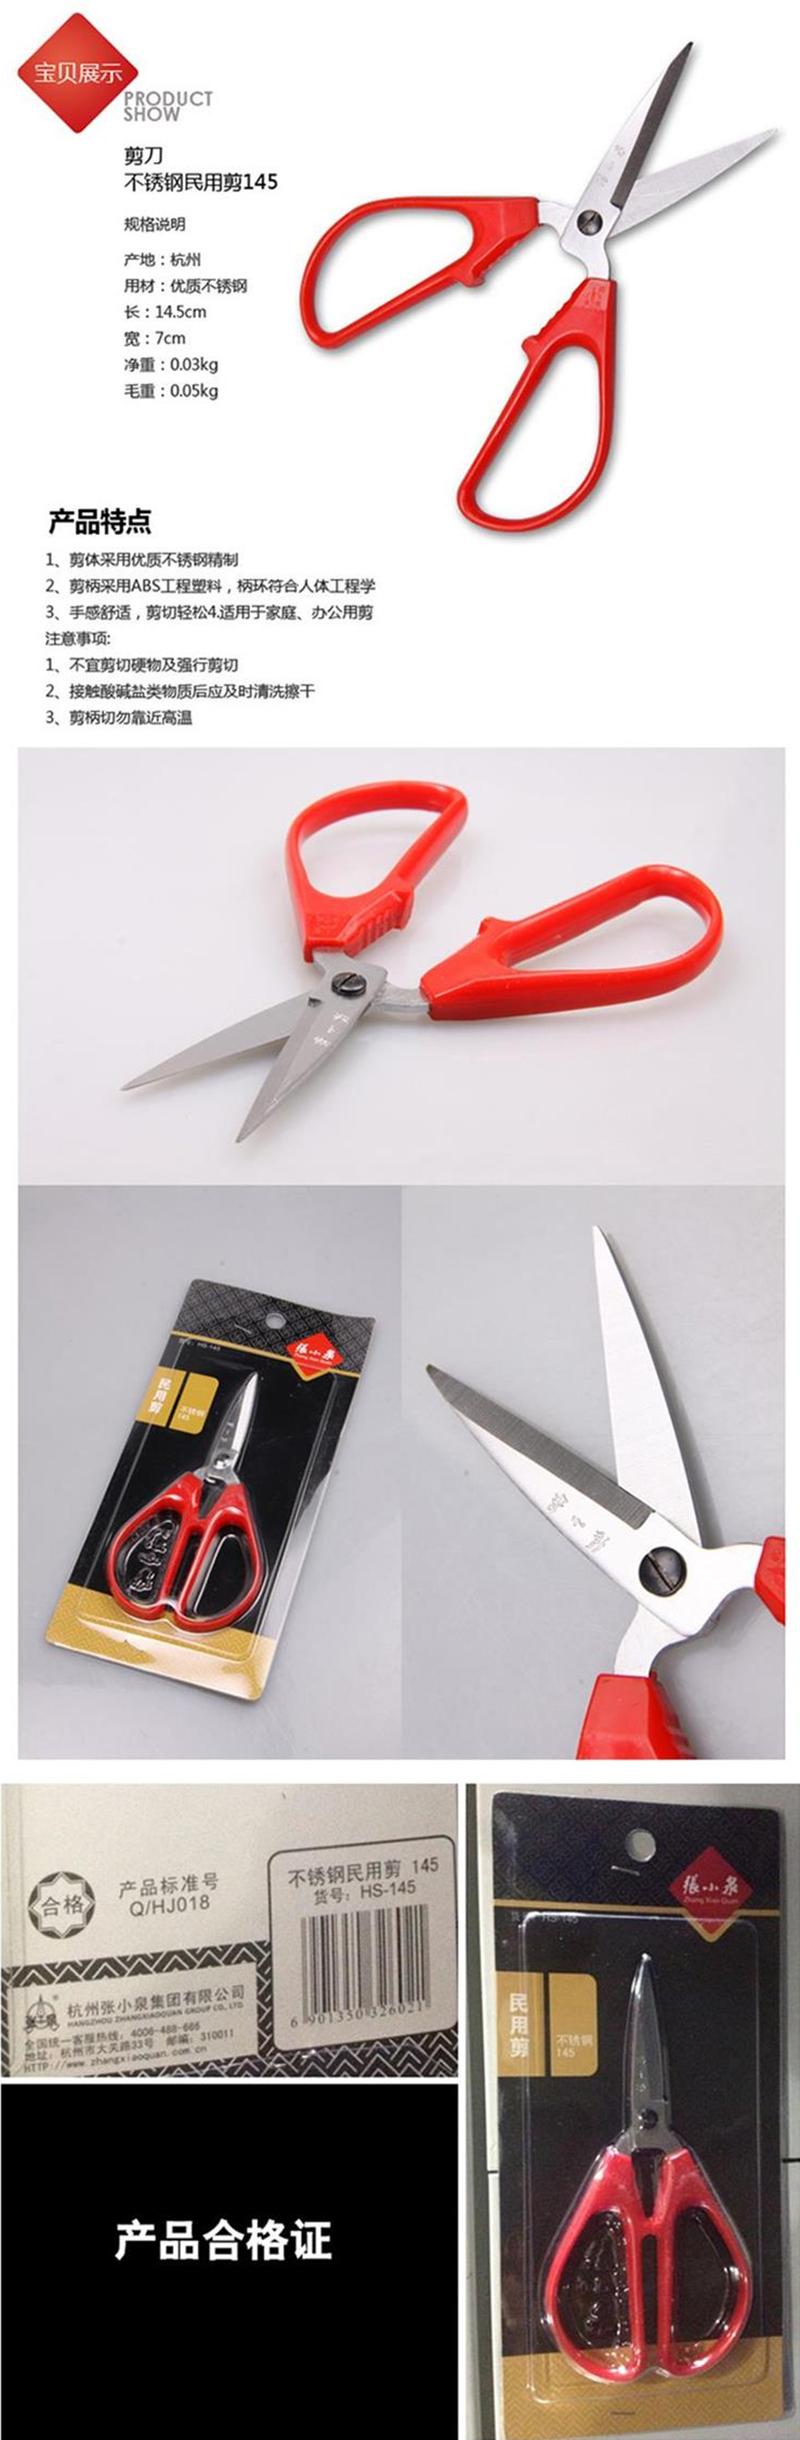 HS-145张小泉剪刀